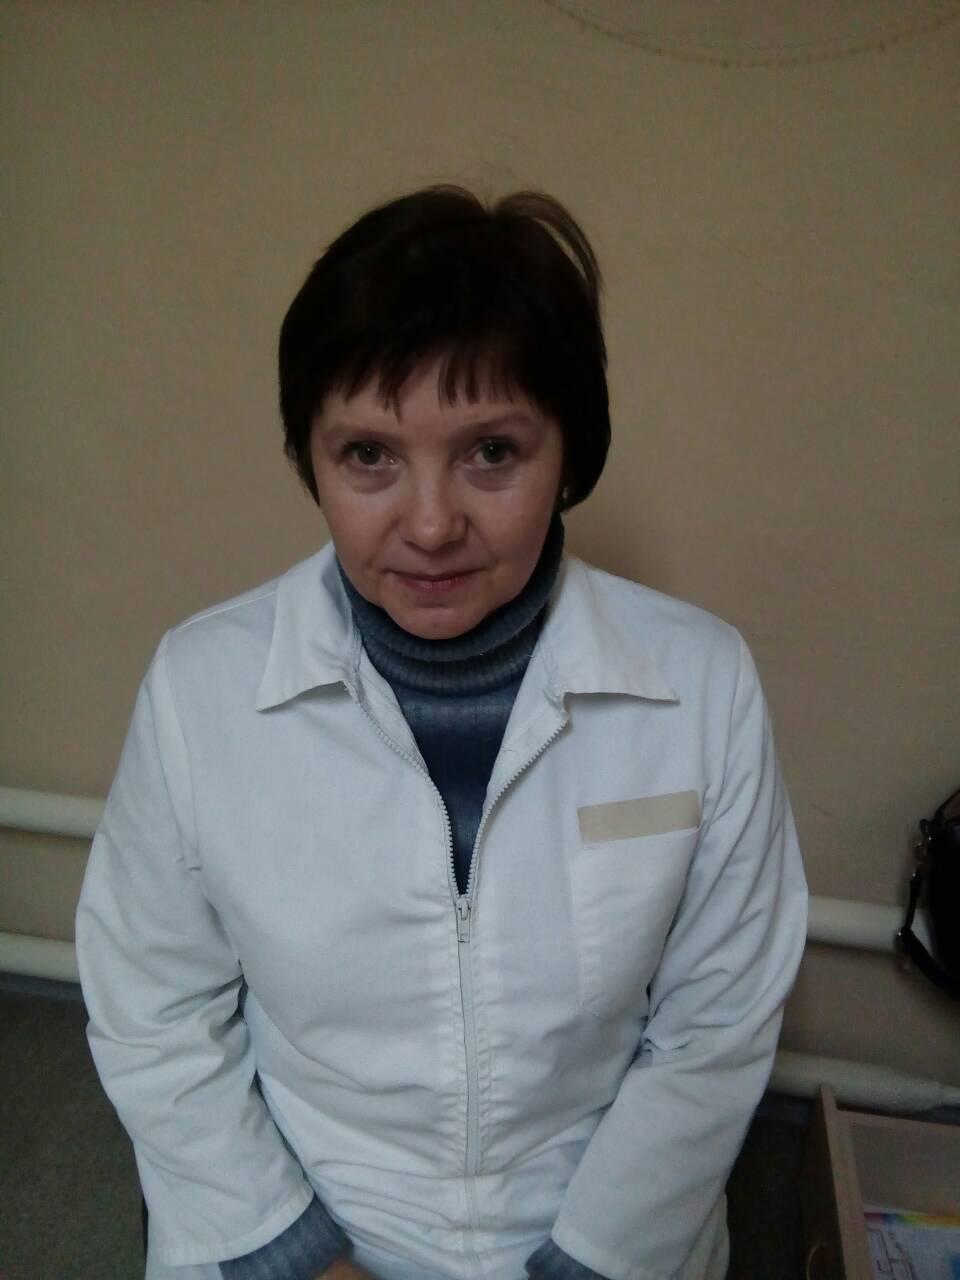 Нагорная Галина Гелиевна, ЦМЭИ